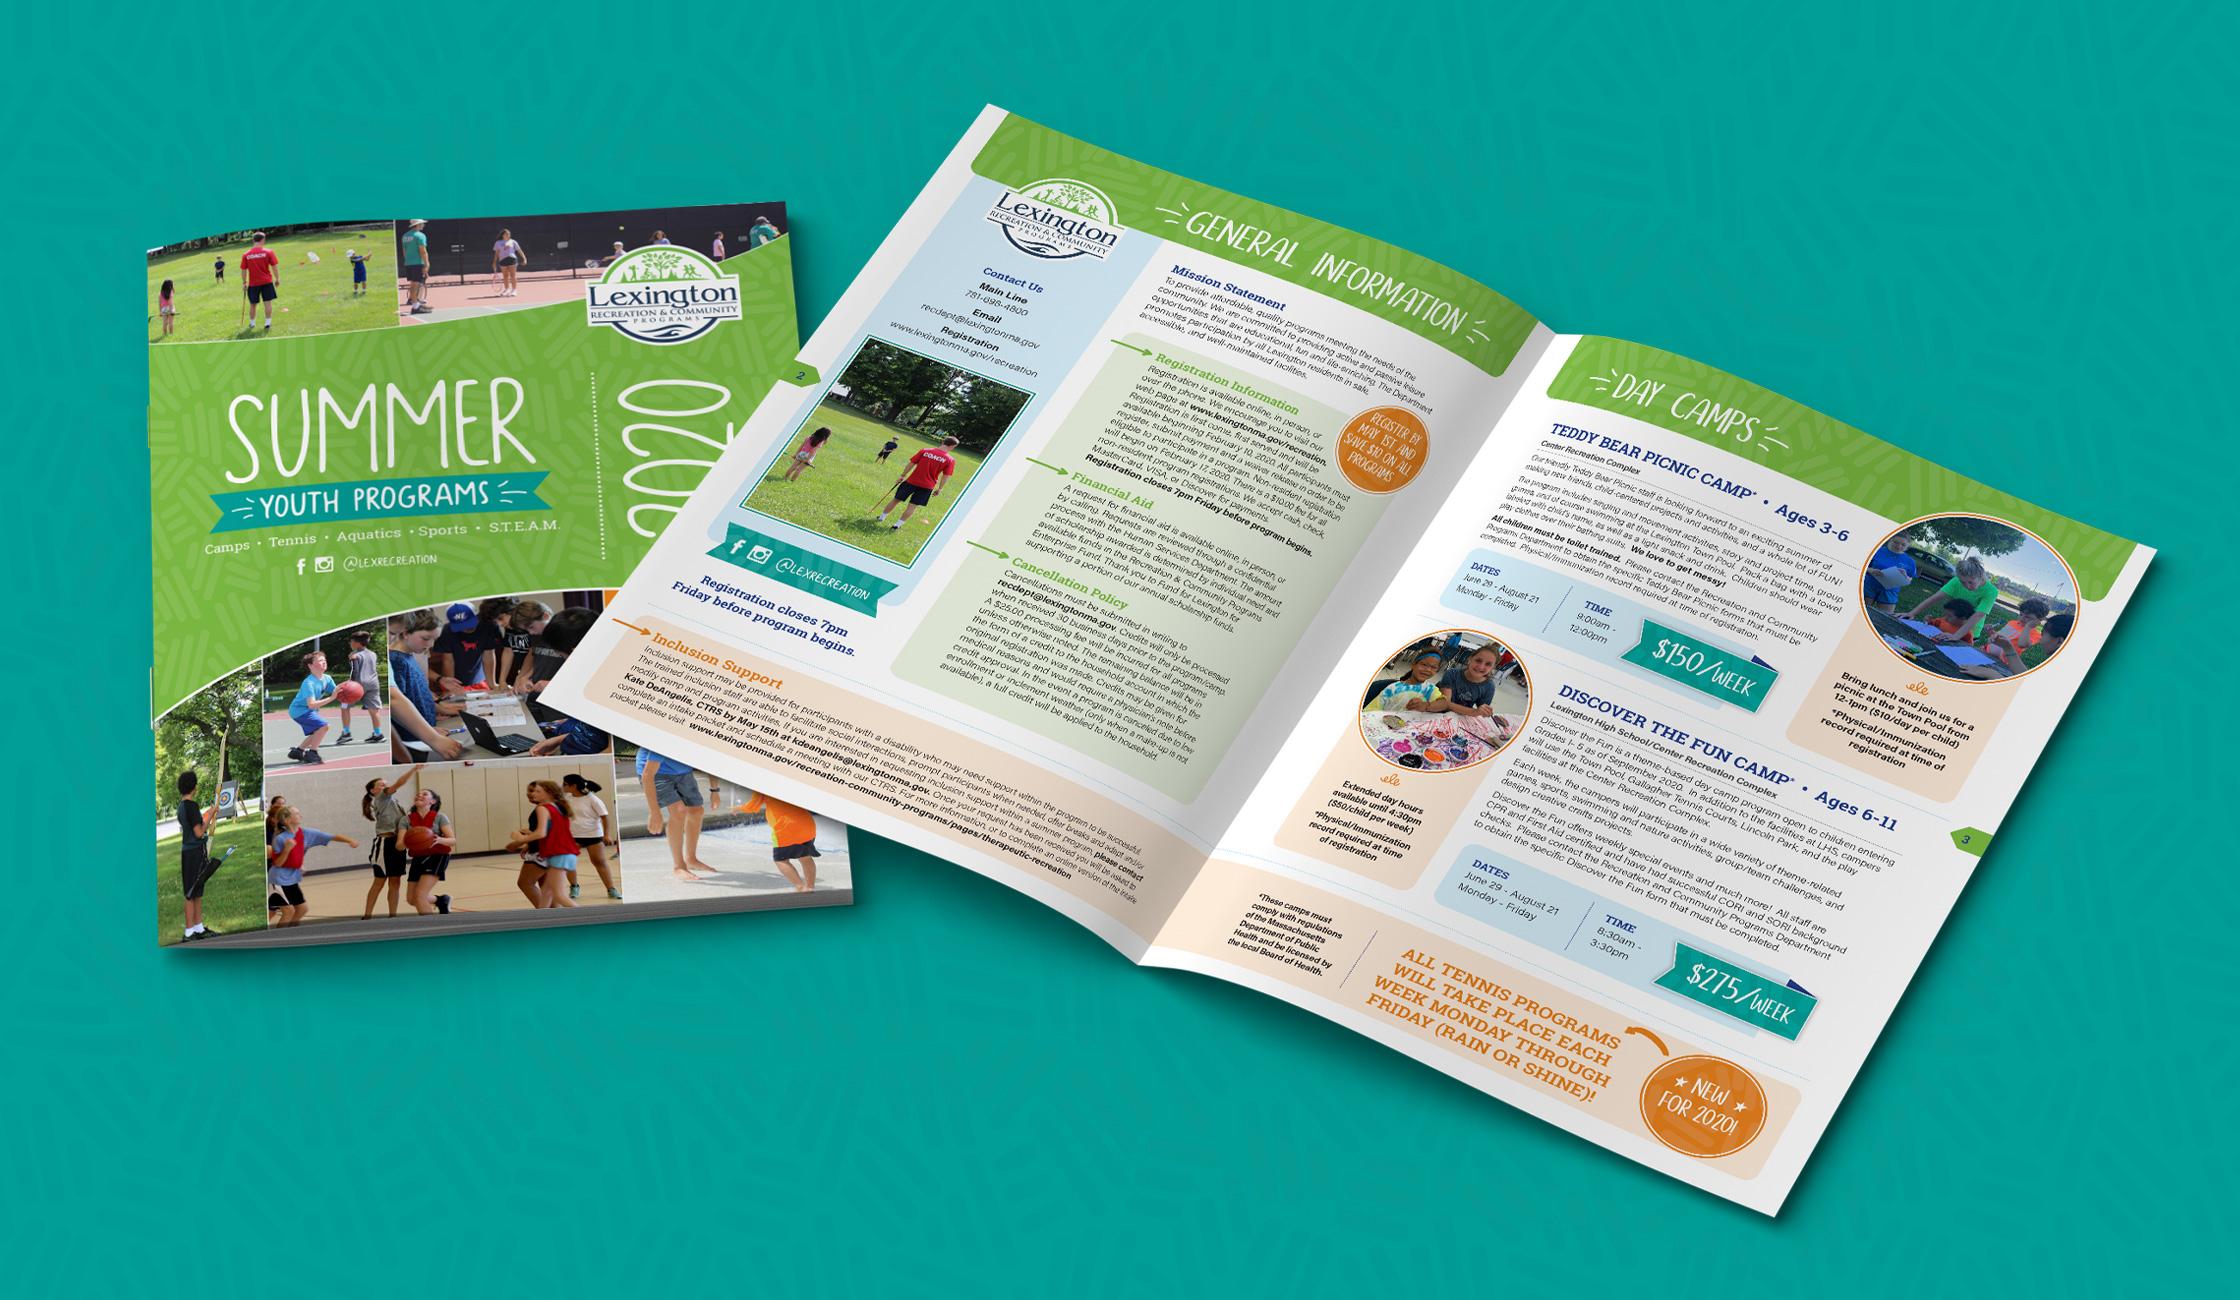 town of lexington summer youth program catalog design